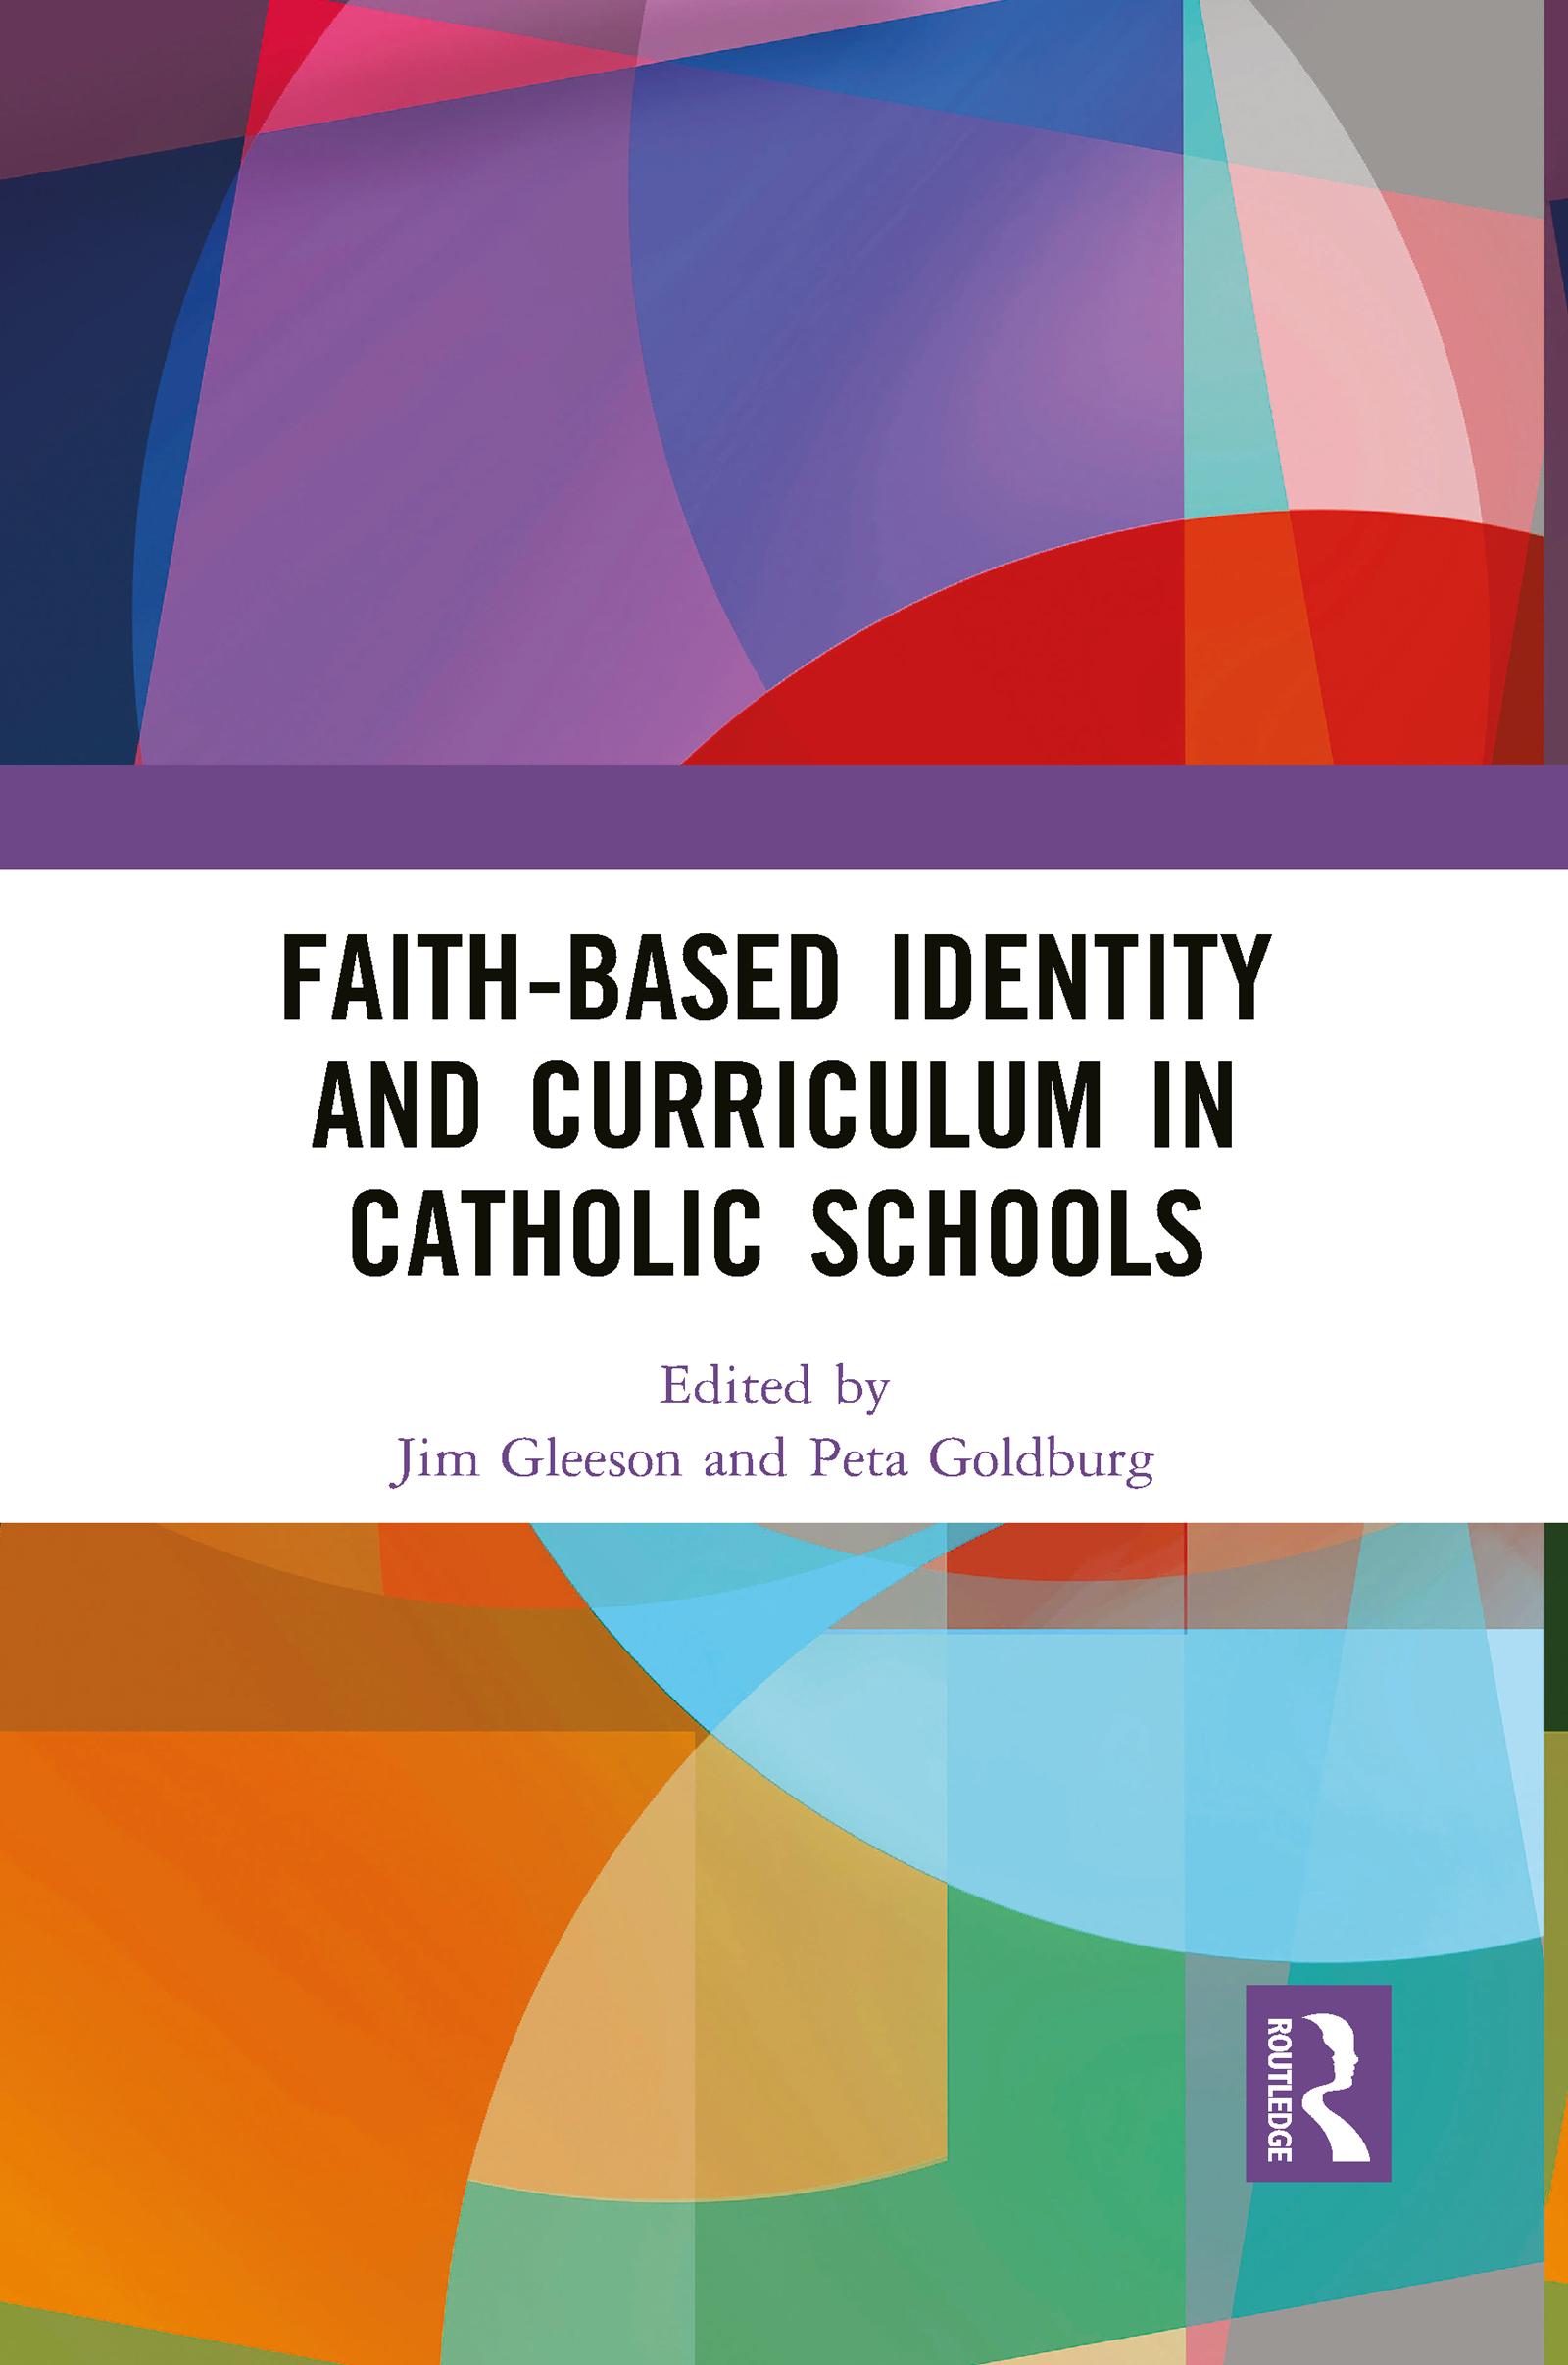 Faith-based Identity and Curriculum in Catholic Schools